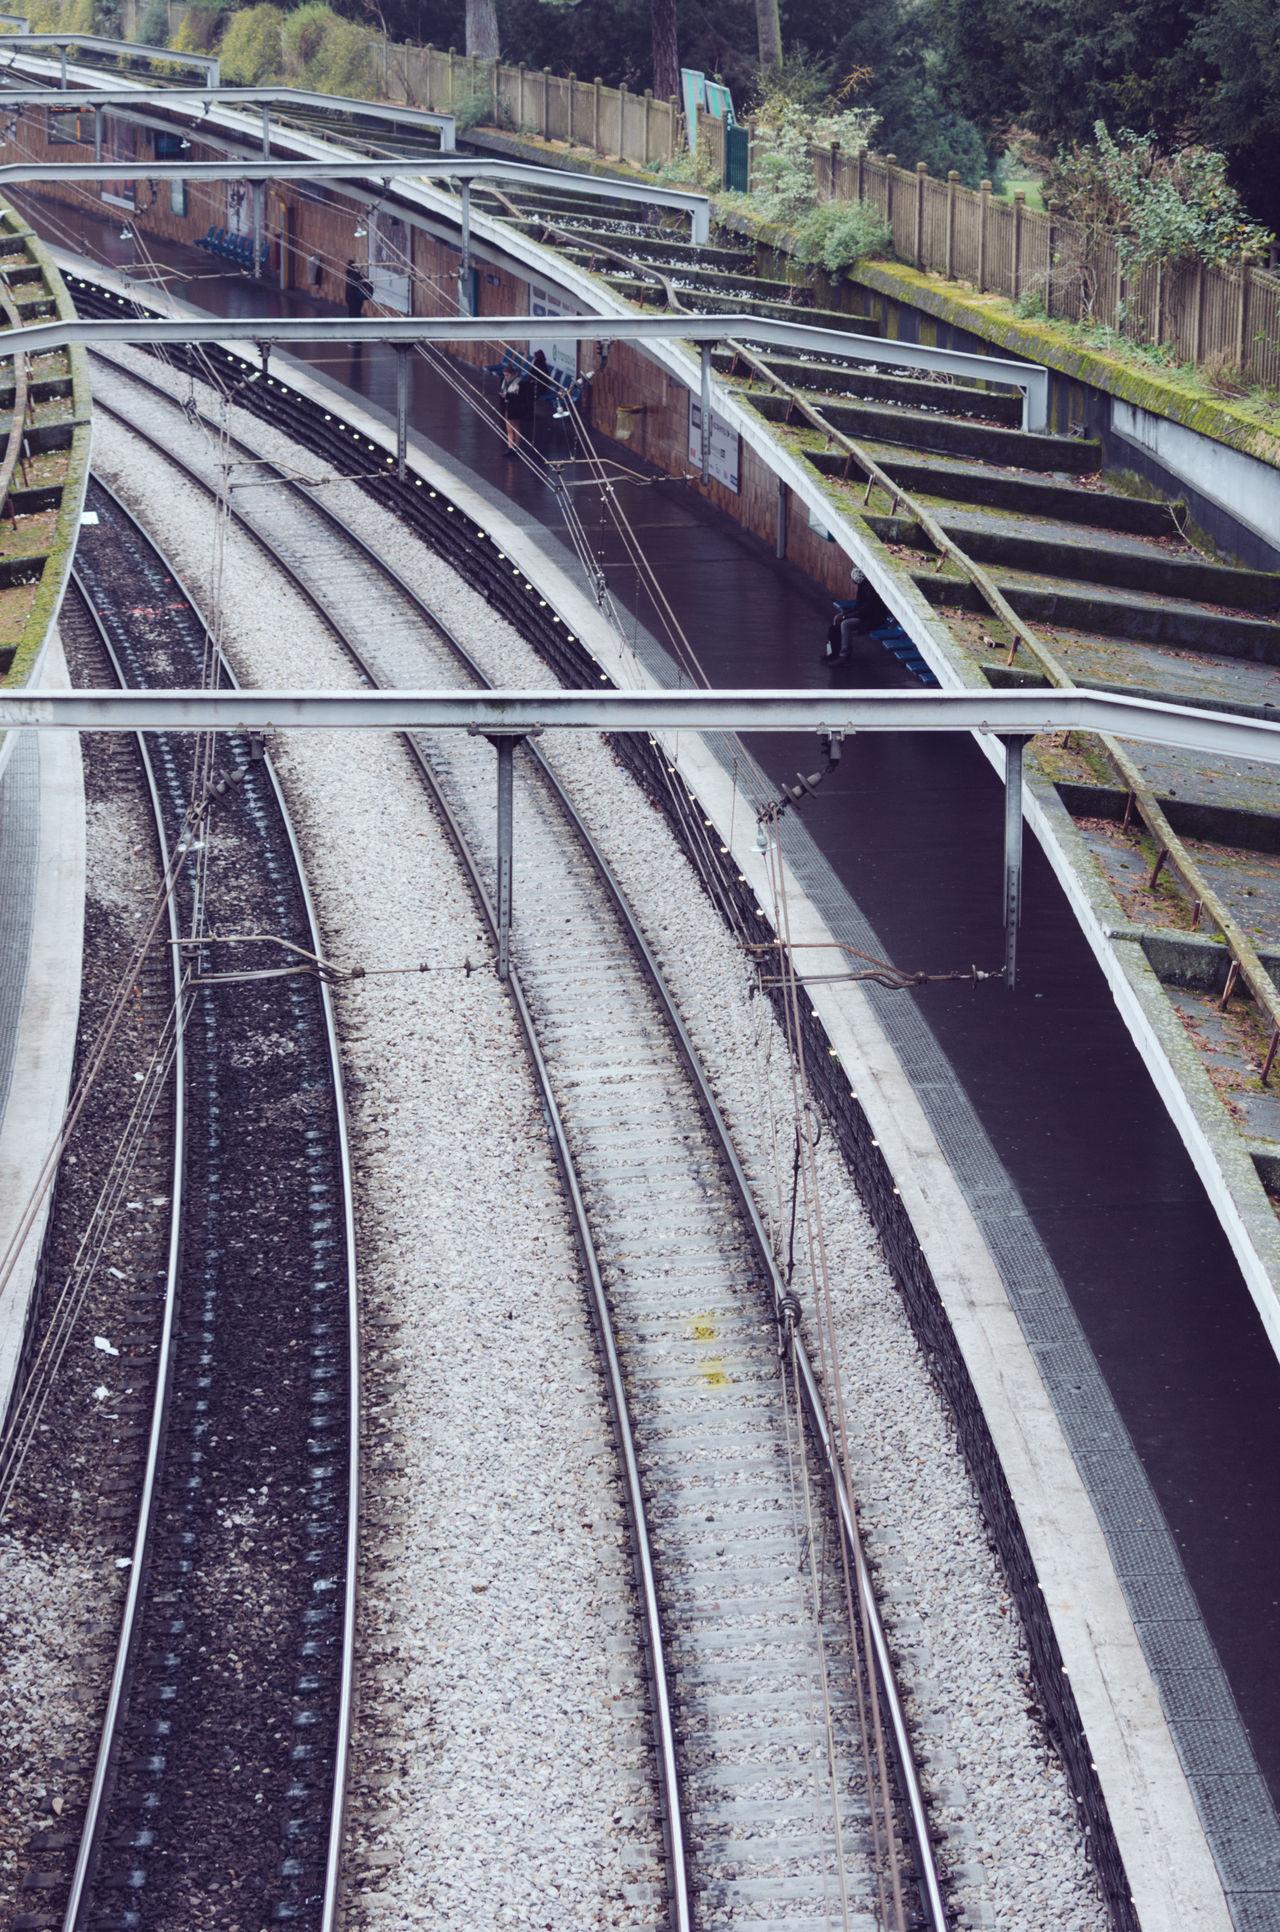 Gare Cite Univesite #film #lazyday #Paris #france  #park Public Transportation Rail Transportation Railroad Station Railroad Station Platform Railroad Track Transportation